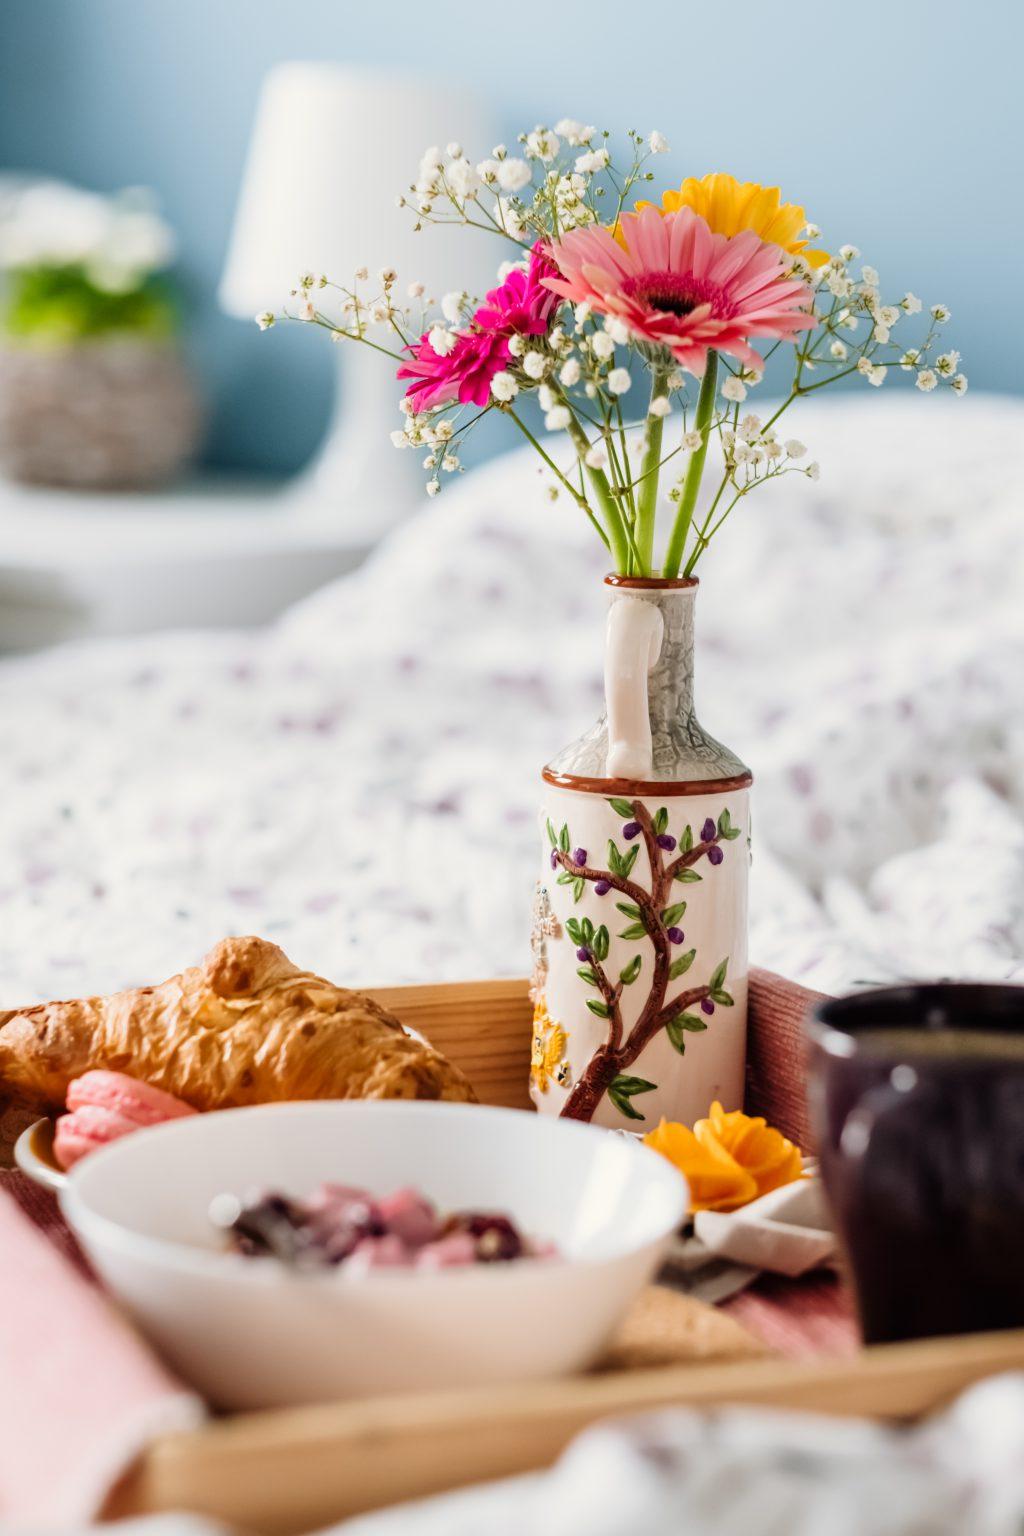 Breakfast in bed 6 - free stock photo